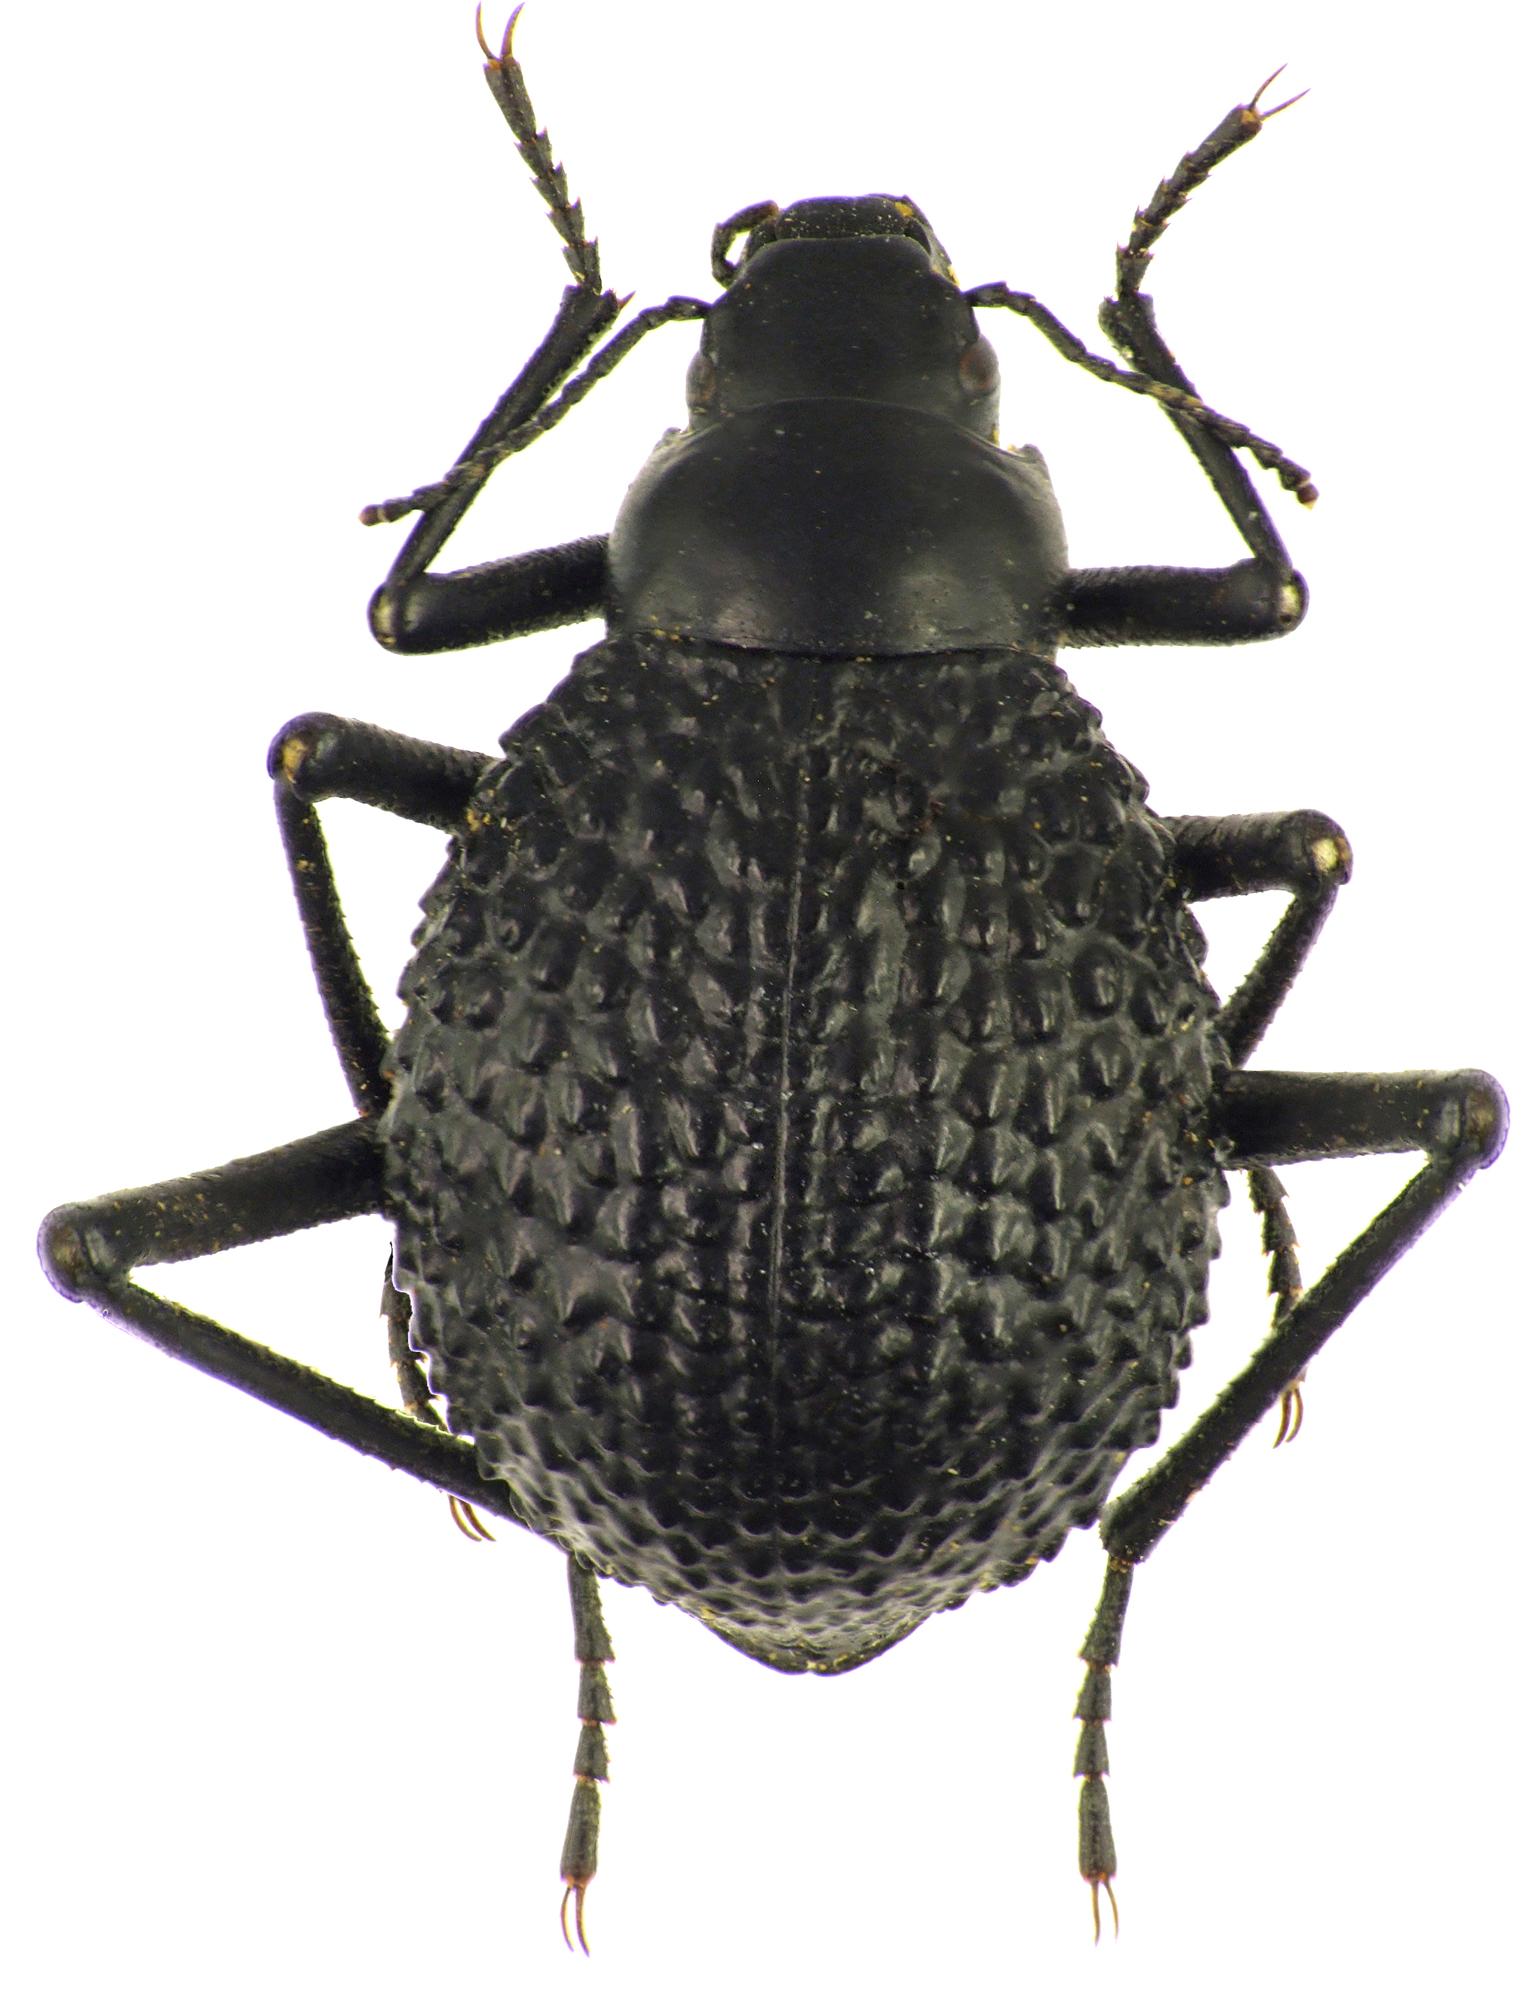 Adesmia biskreensis asperrima 83479cz88.jpg